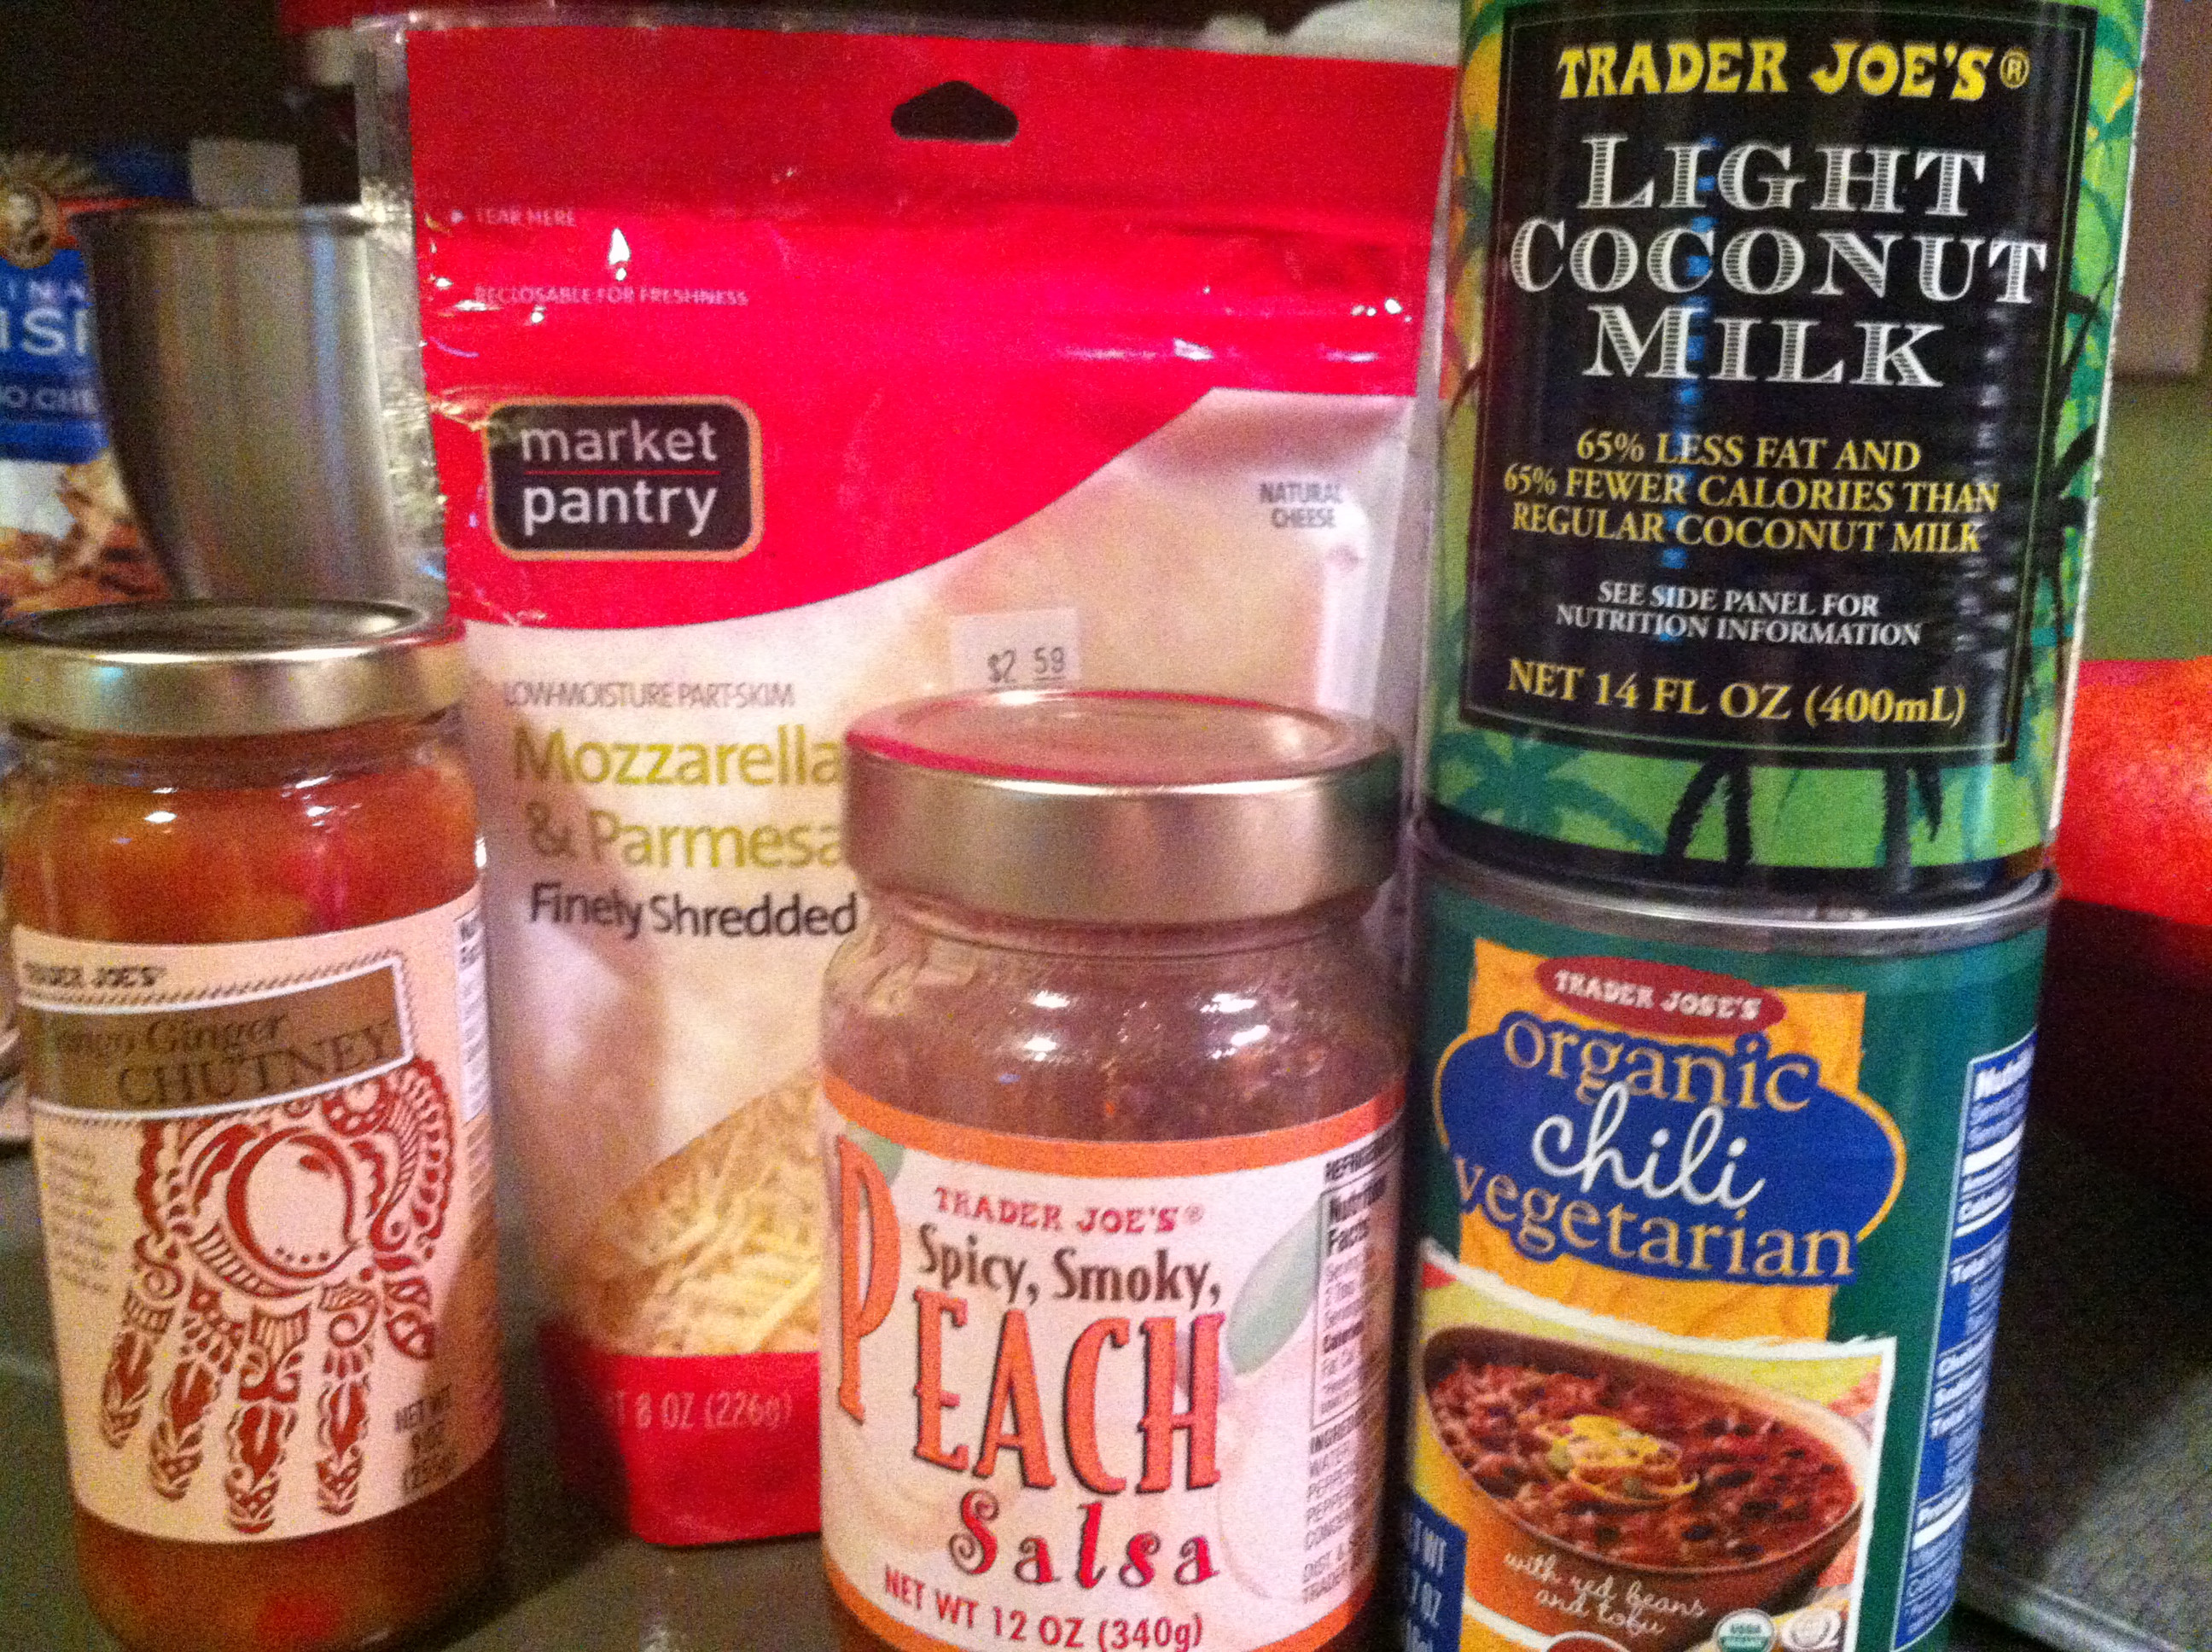 Trader Joe'S Organic Vegetarian Chili  Sweet n' Spicy Macaroni & Chili